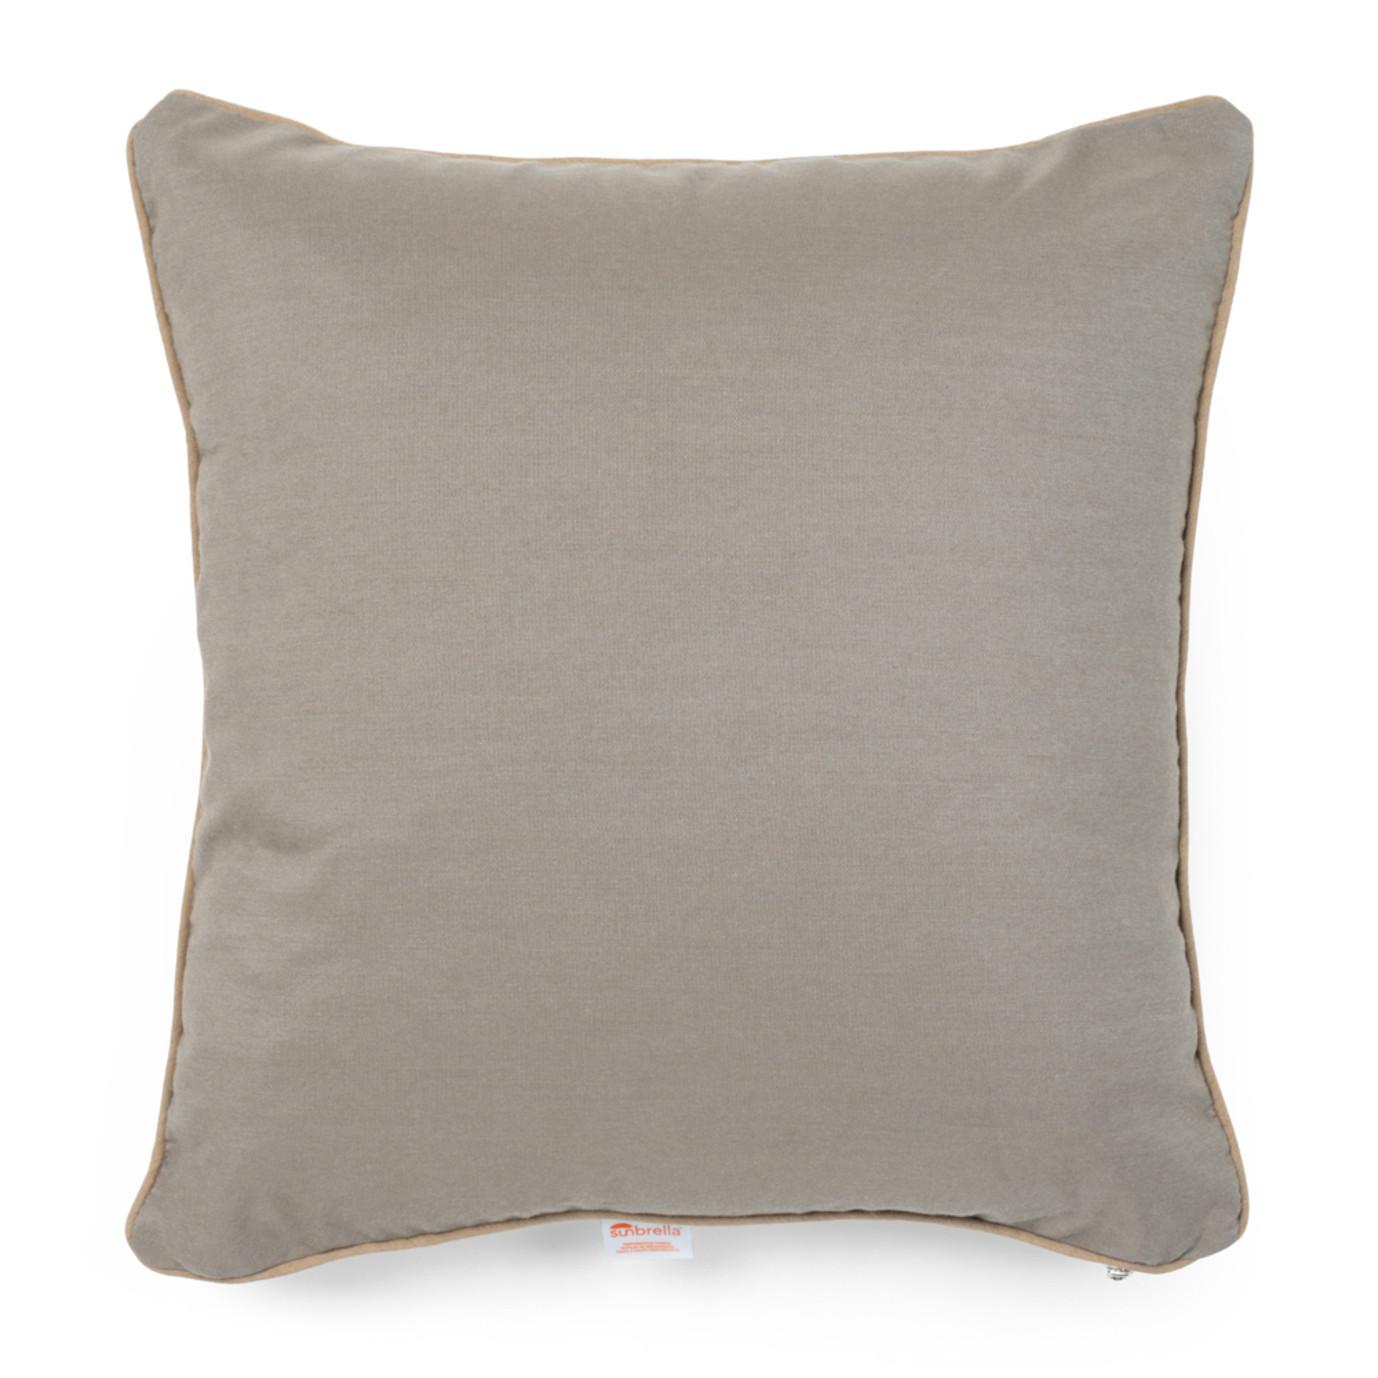 Portofino® Comfort 20in Accent Pillow